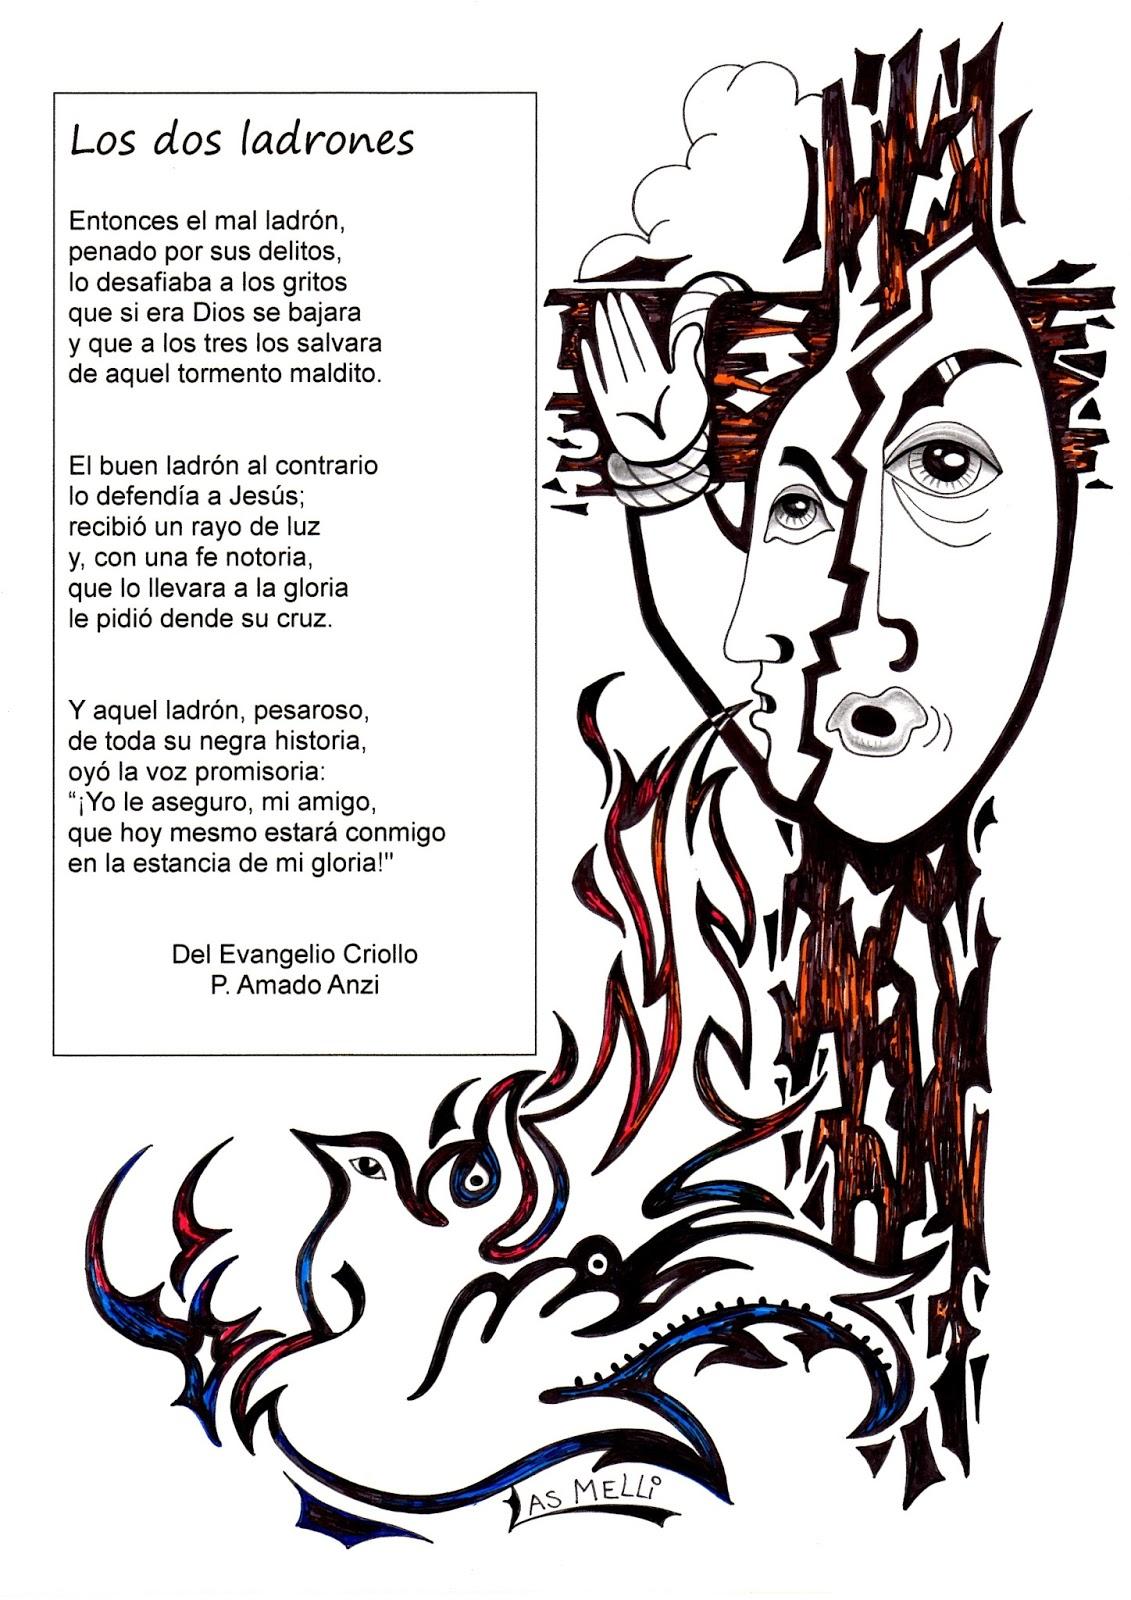 PARA COLOREAR: Evangelio criollo para colorear